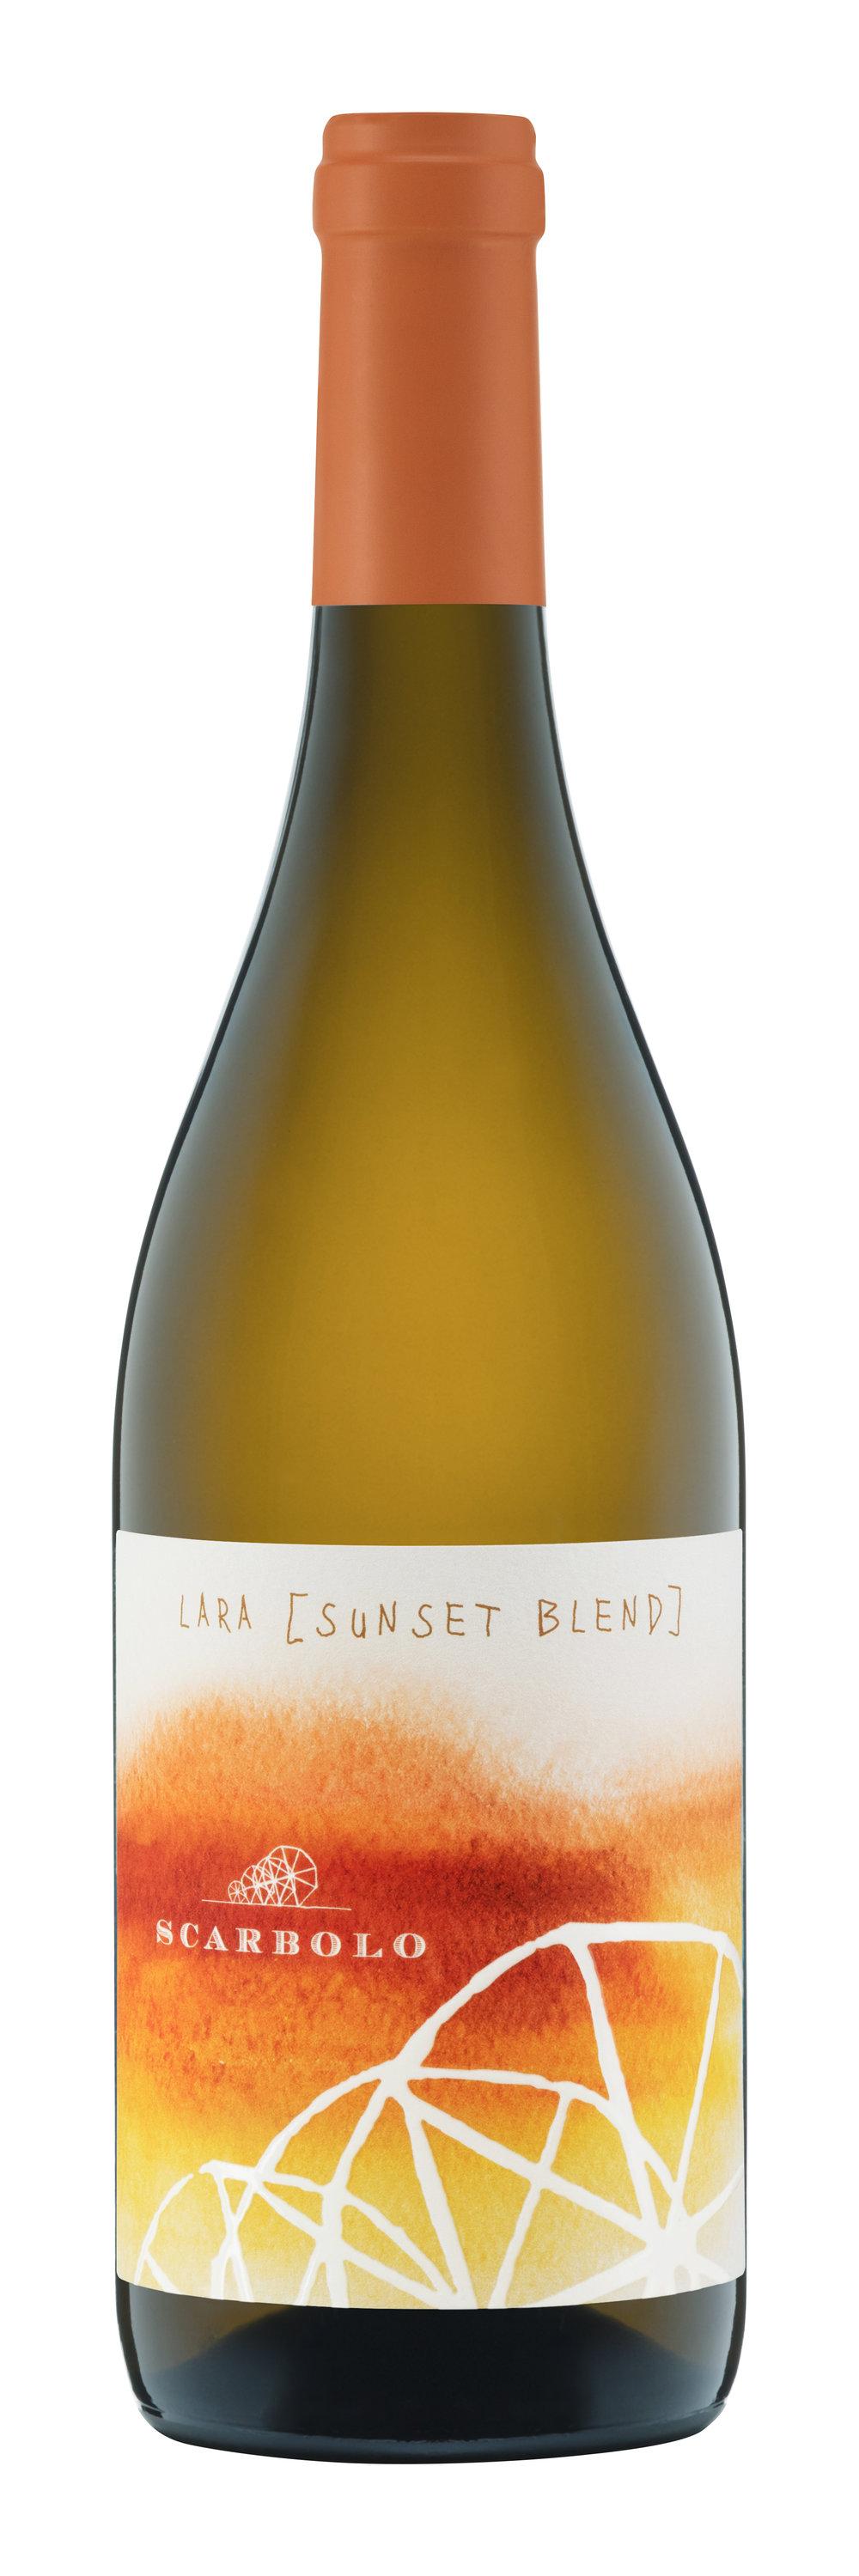 Lara Chardonnay 'Sunset Blend'